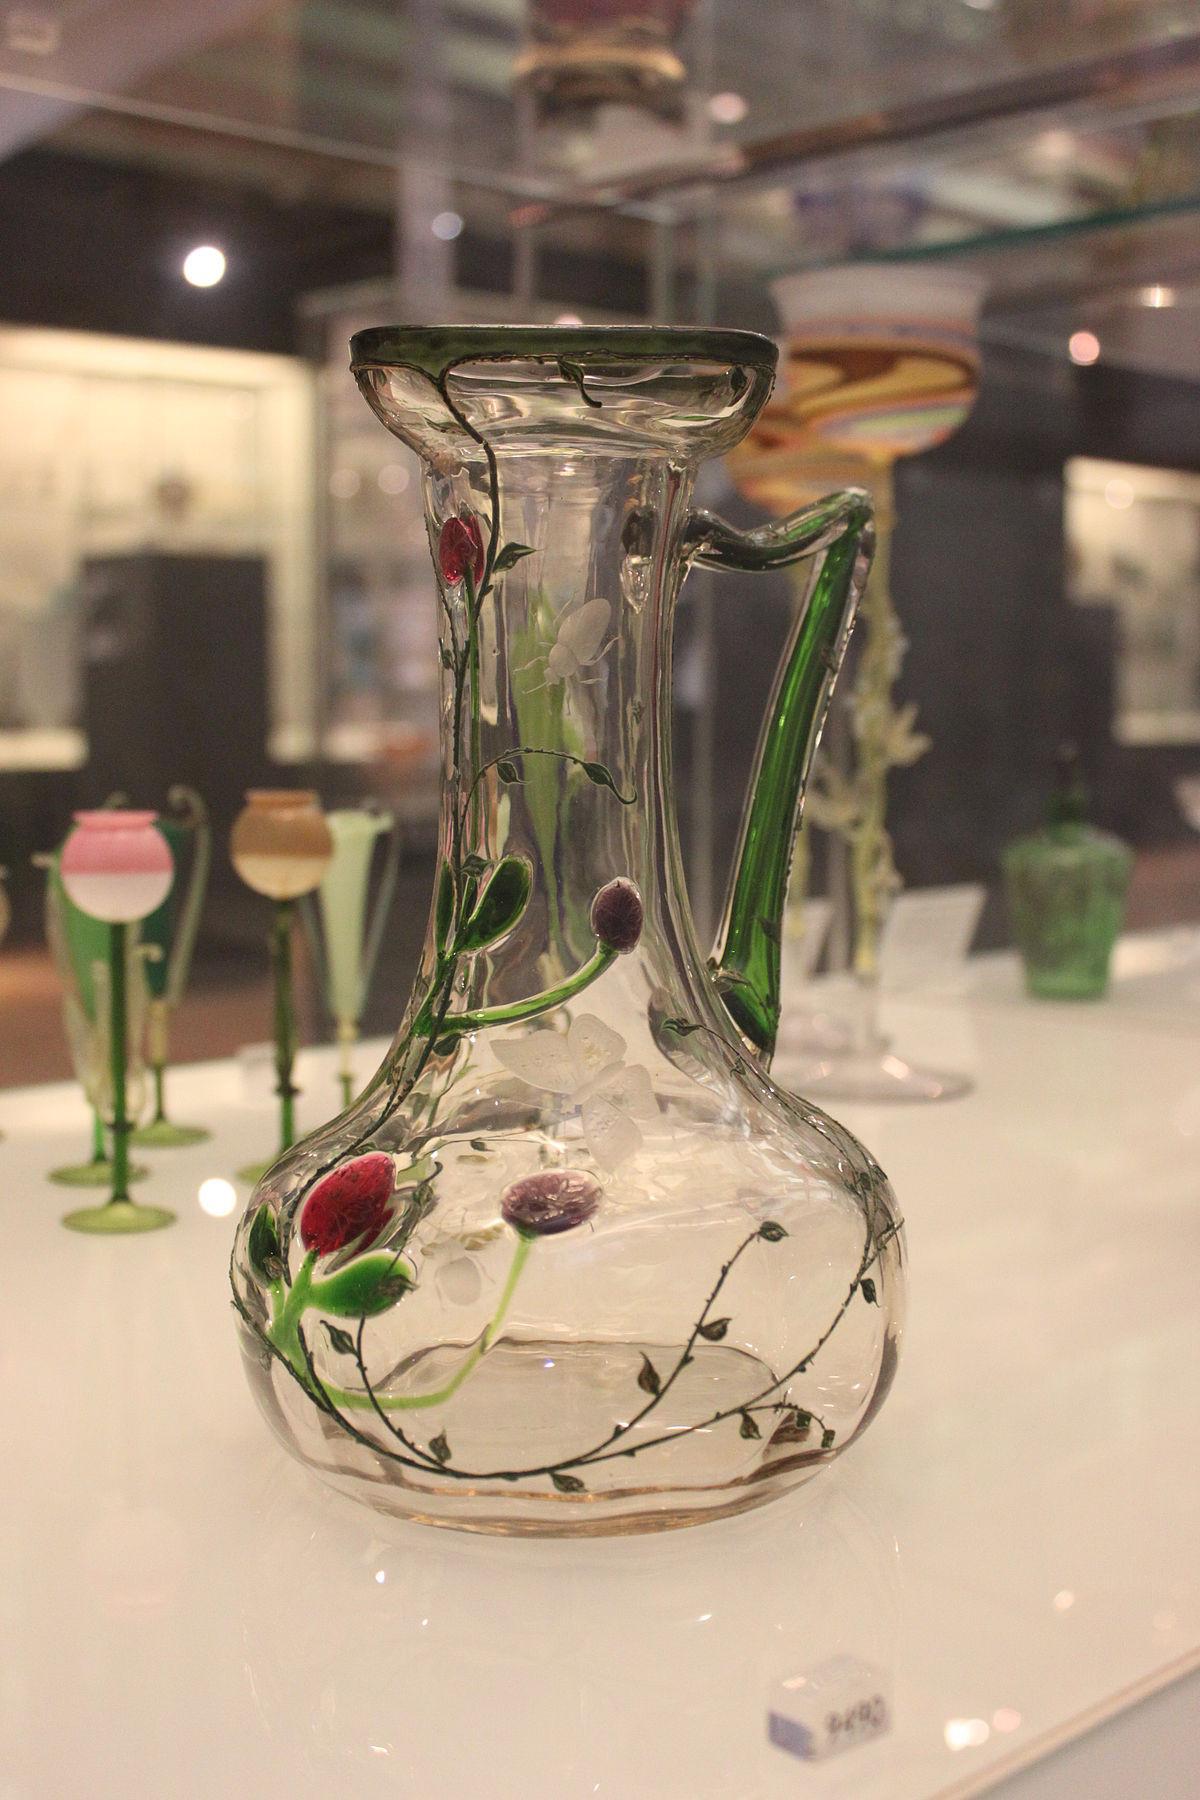 europa glass vase of bohemian glass wikipedia with 1200px blw bohemian jug